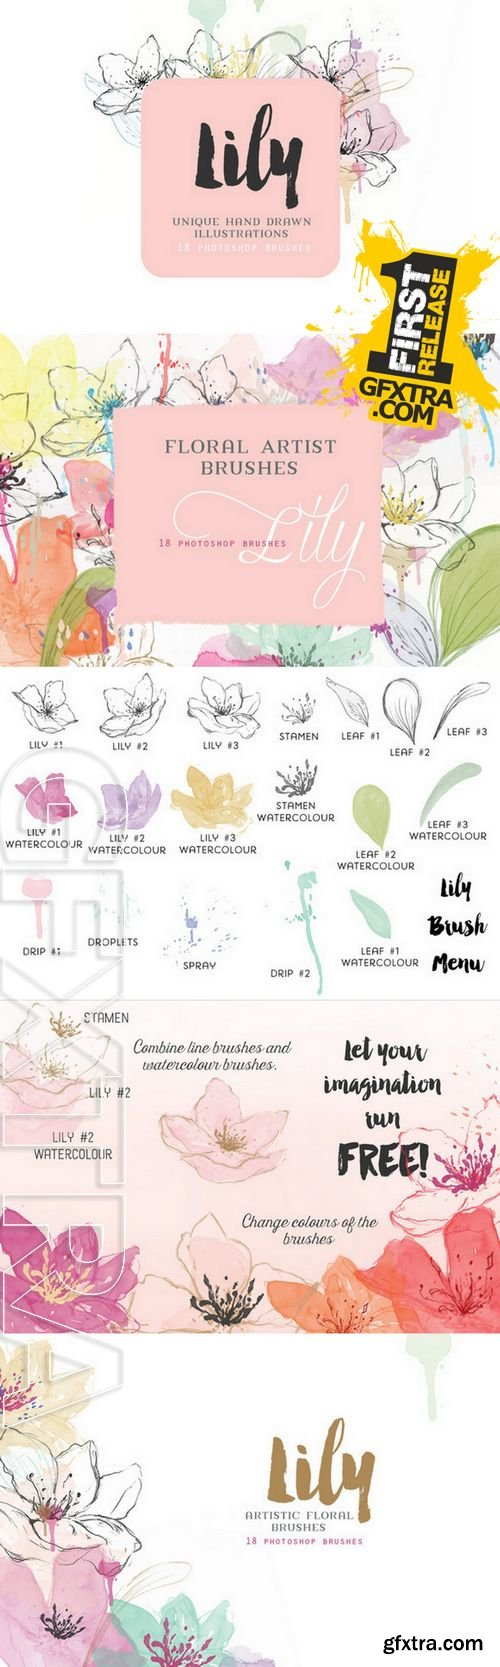 Floral Photoshop Brushes - CM 143874